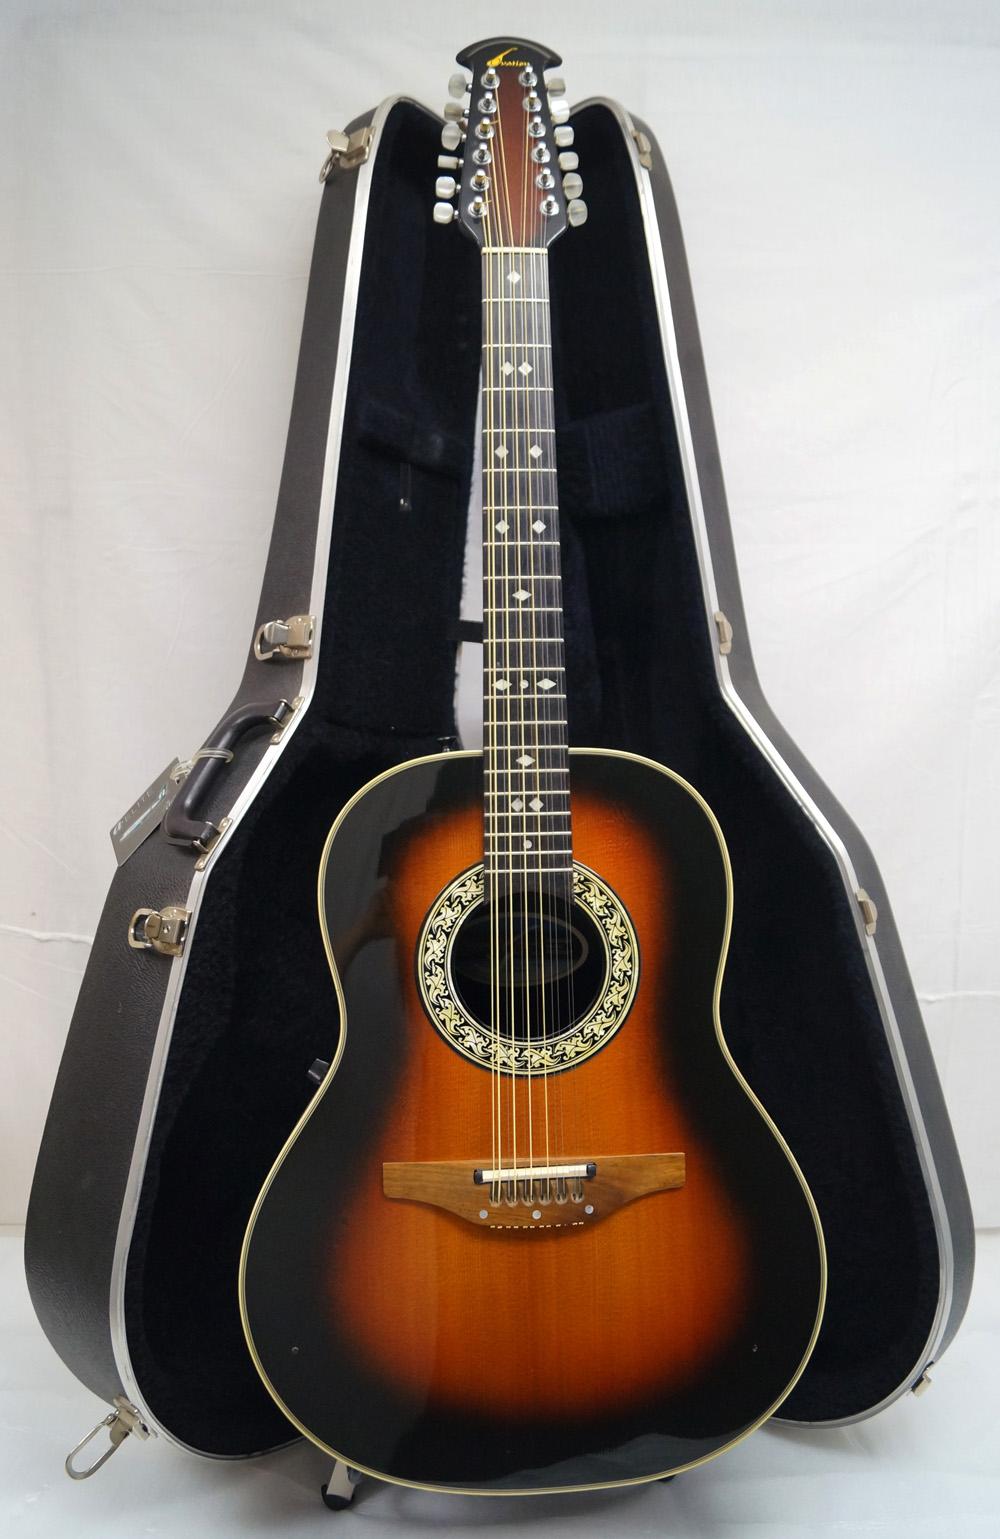 used ovation 1755 balladeer 12 string acoustic electric guitar vgc ebay. Black Bedroom Furniture Sets. Home Design Ideas